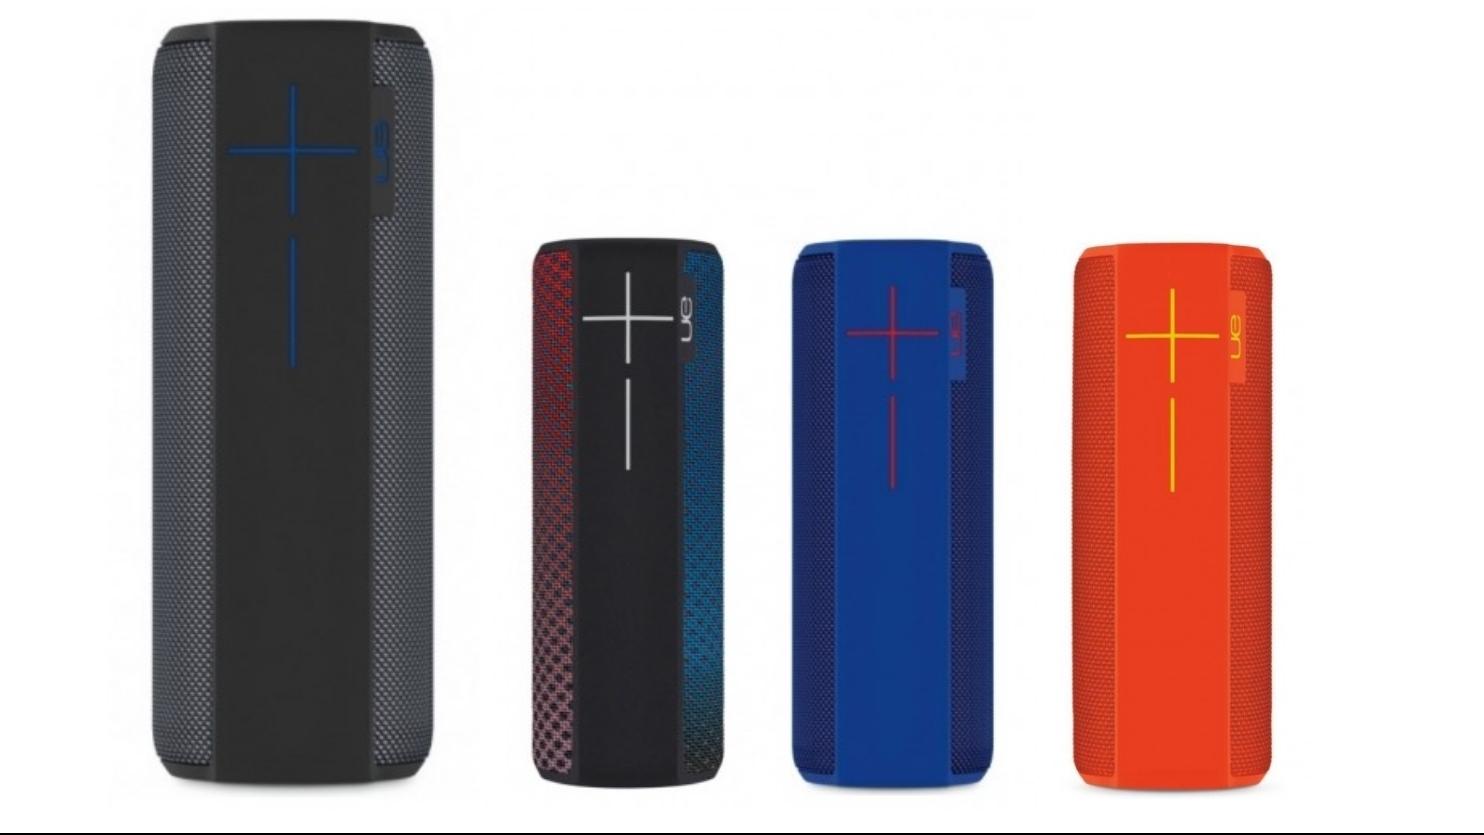 ULTIMATE EARS MEGABOOM Portable Wireless Speaker